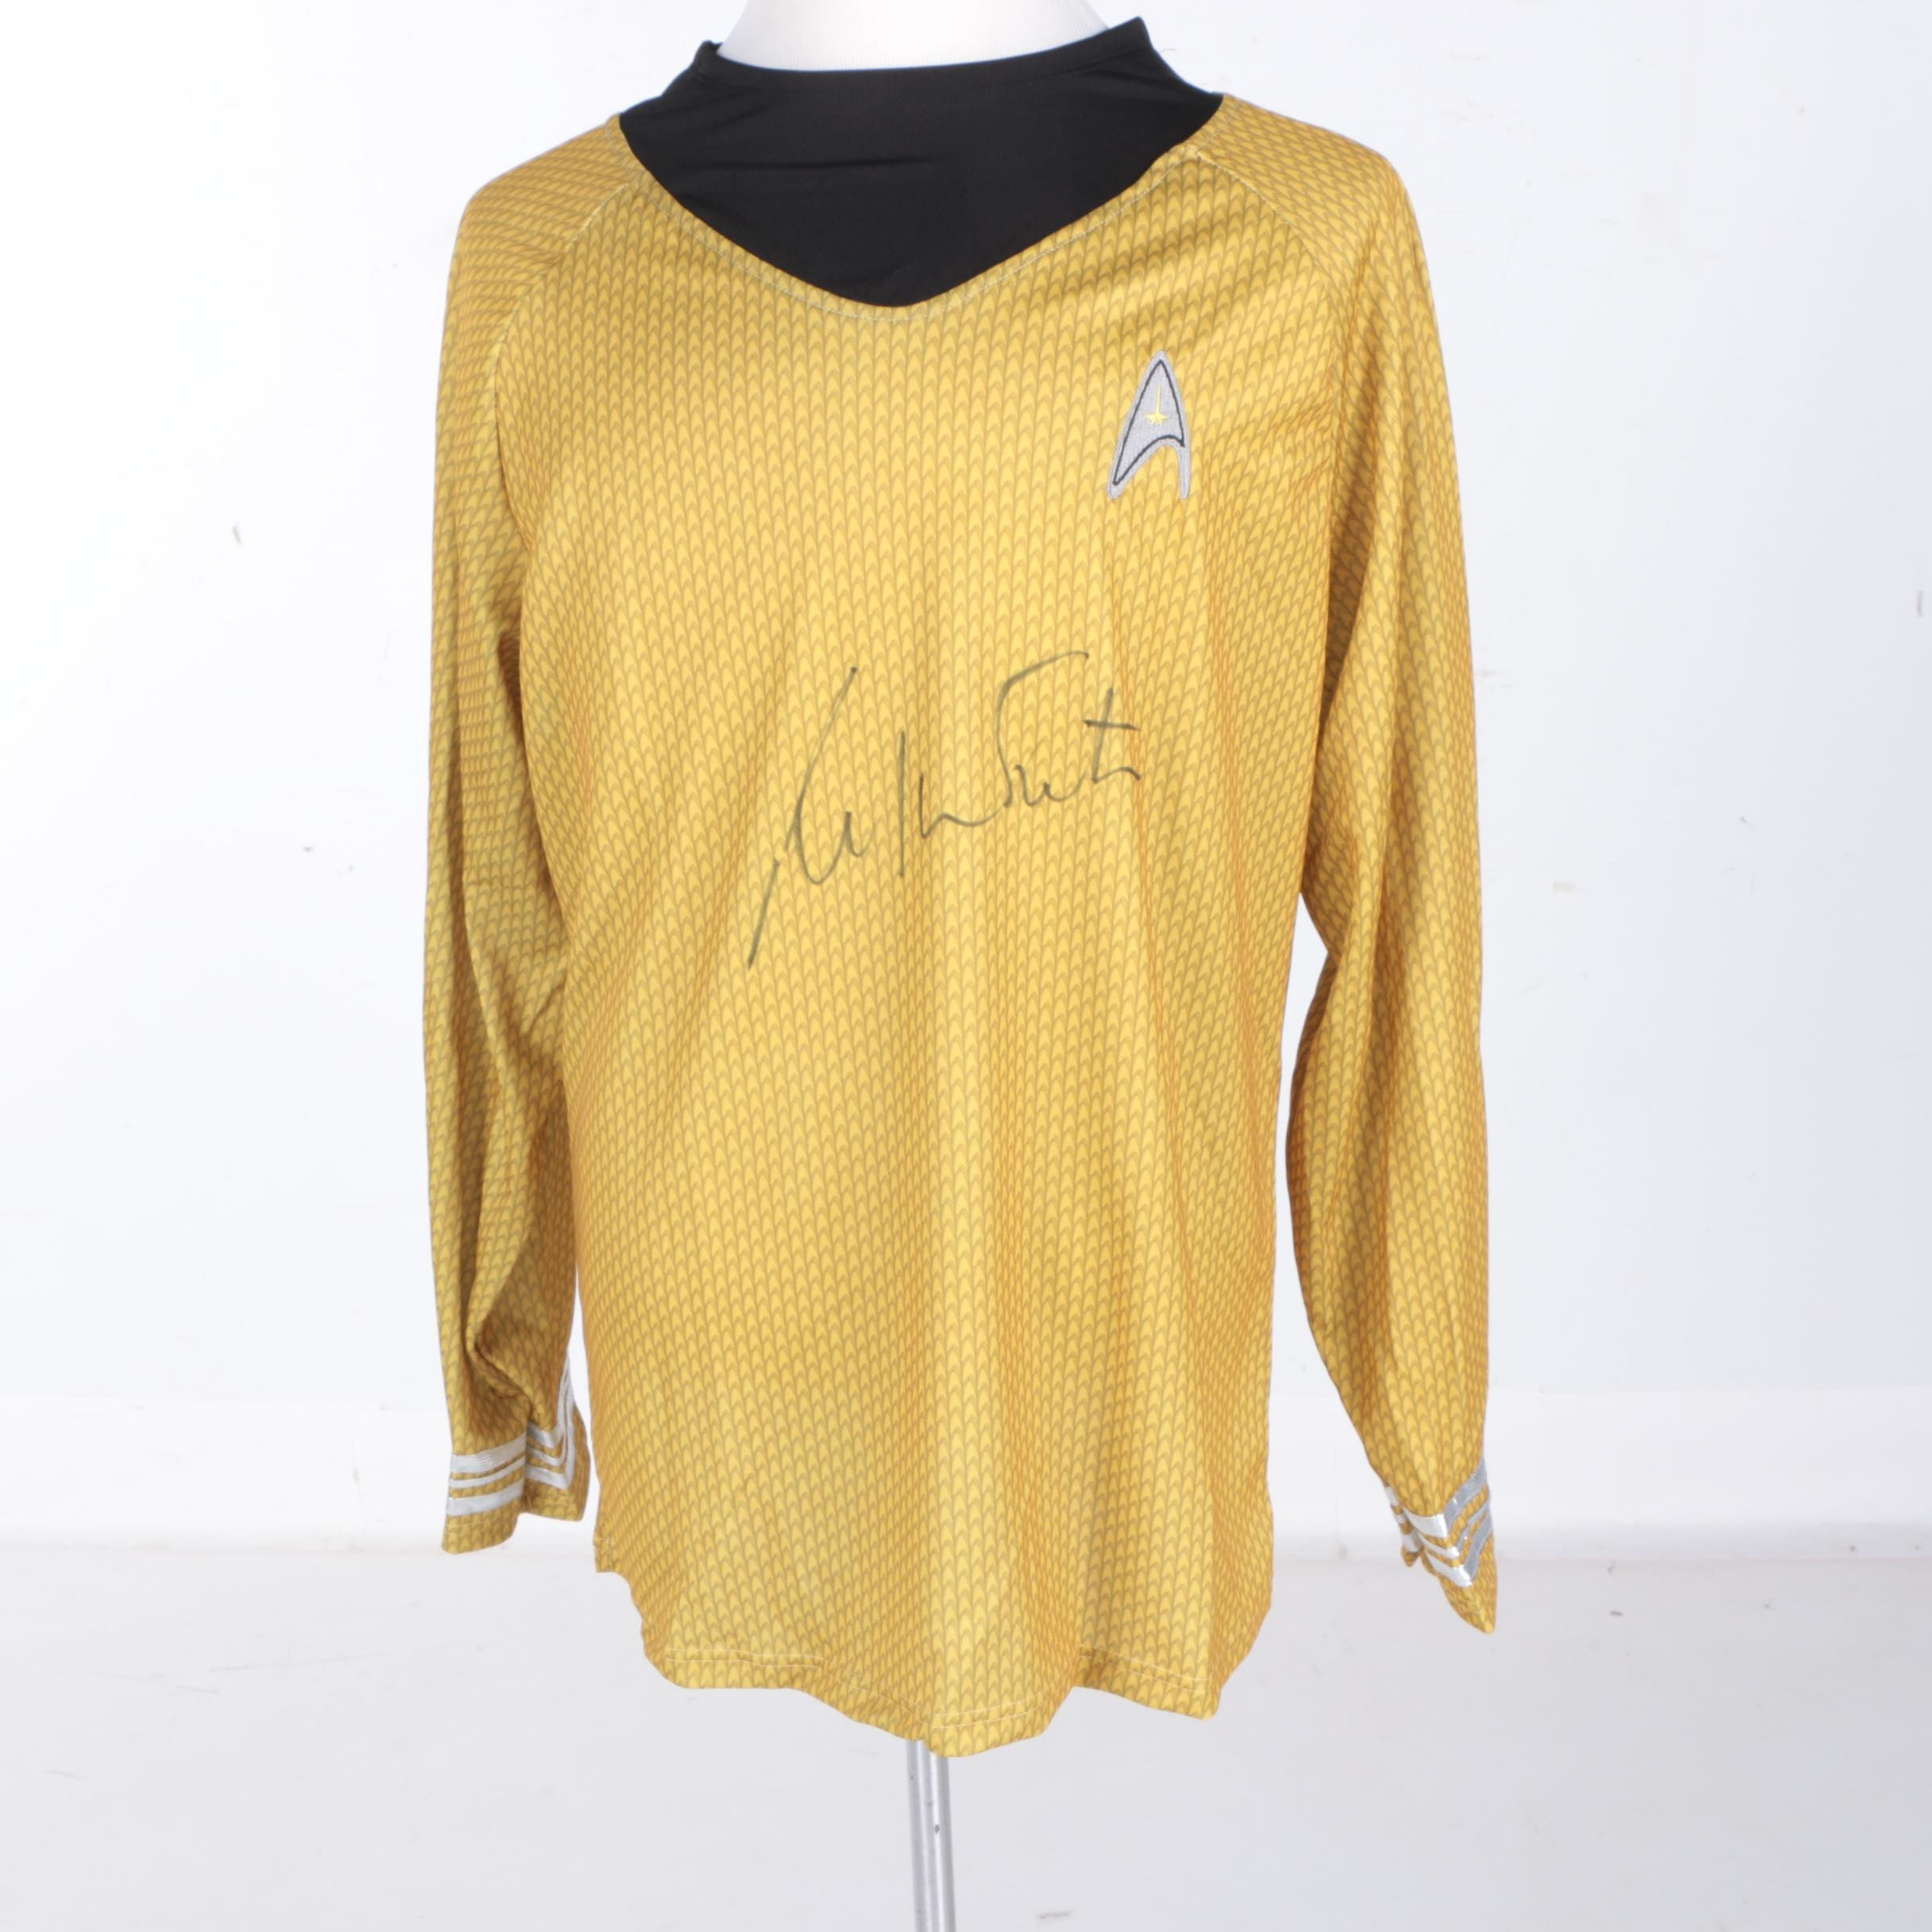 William Shatner Autographed Star Trek Costume - JSA COA